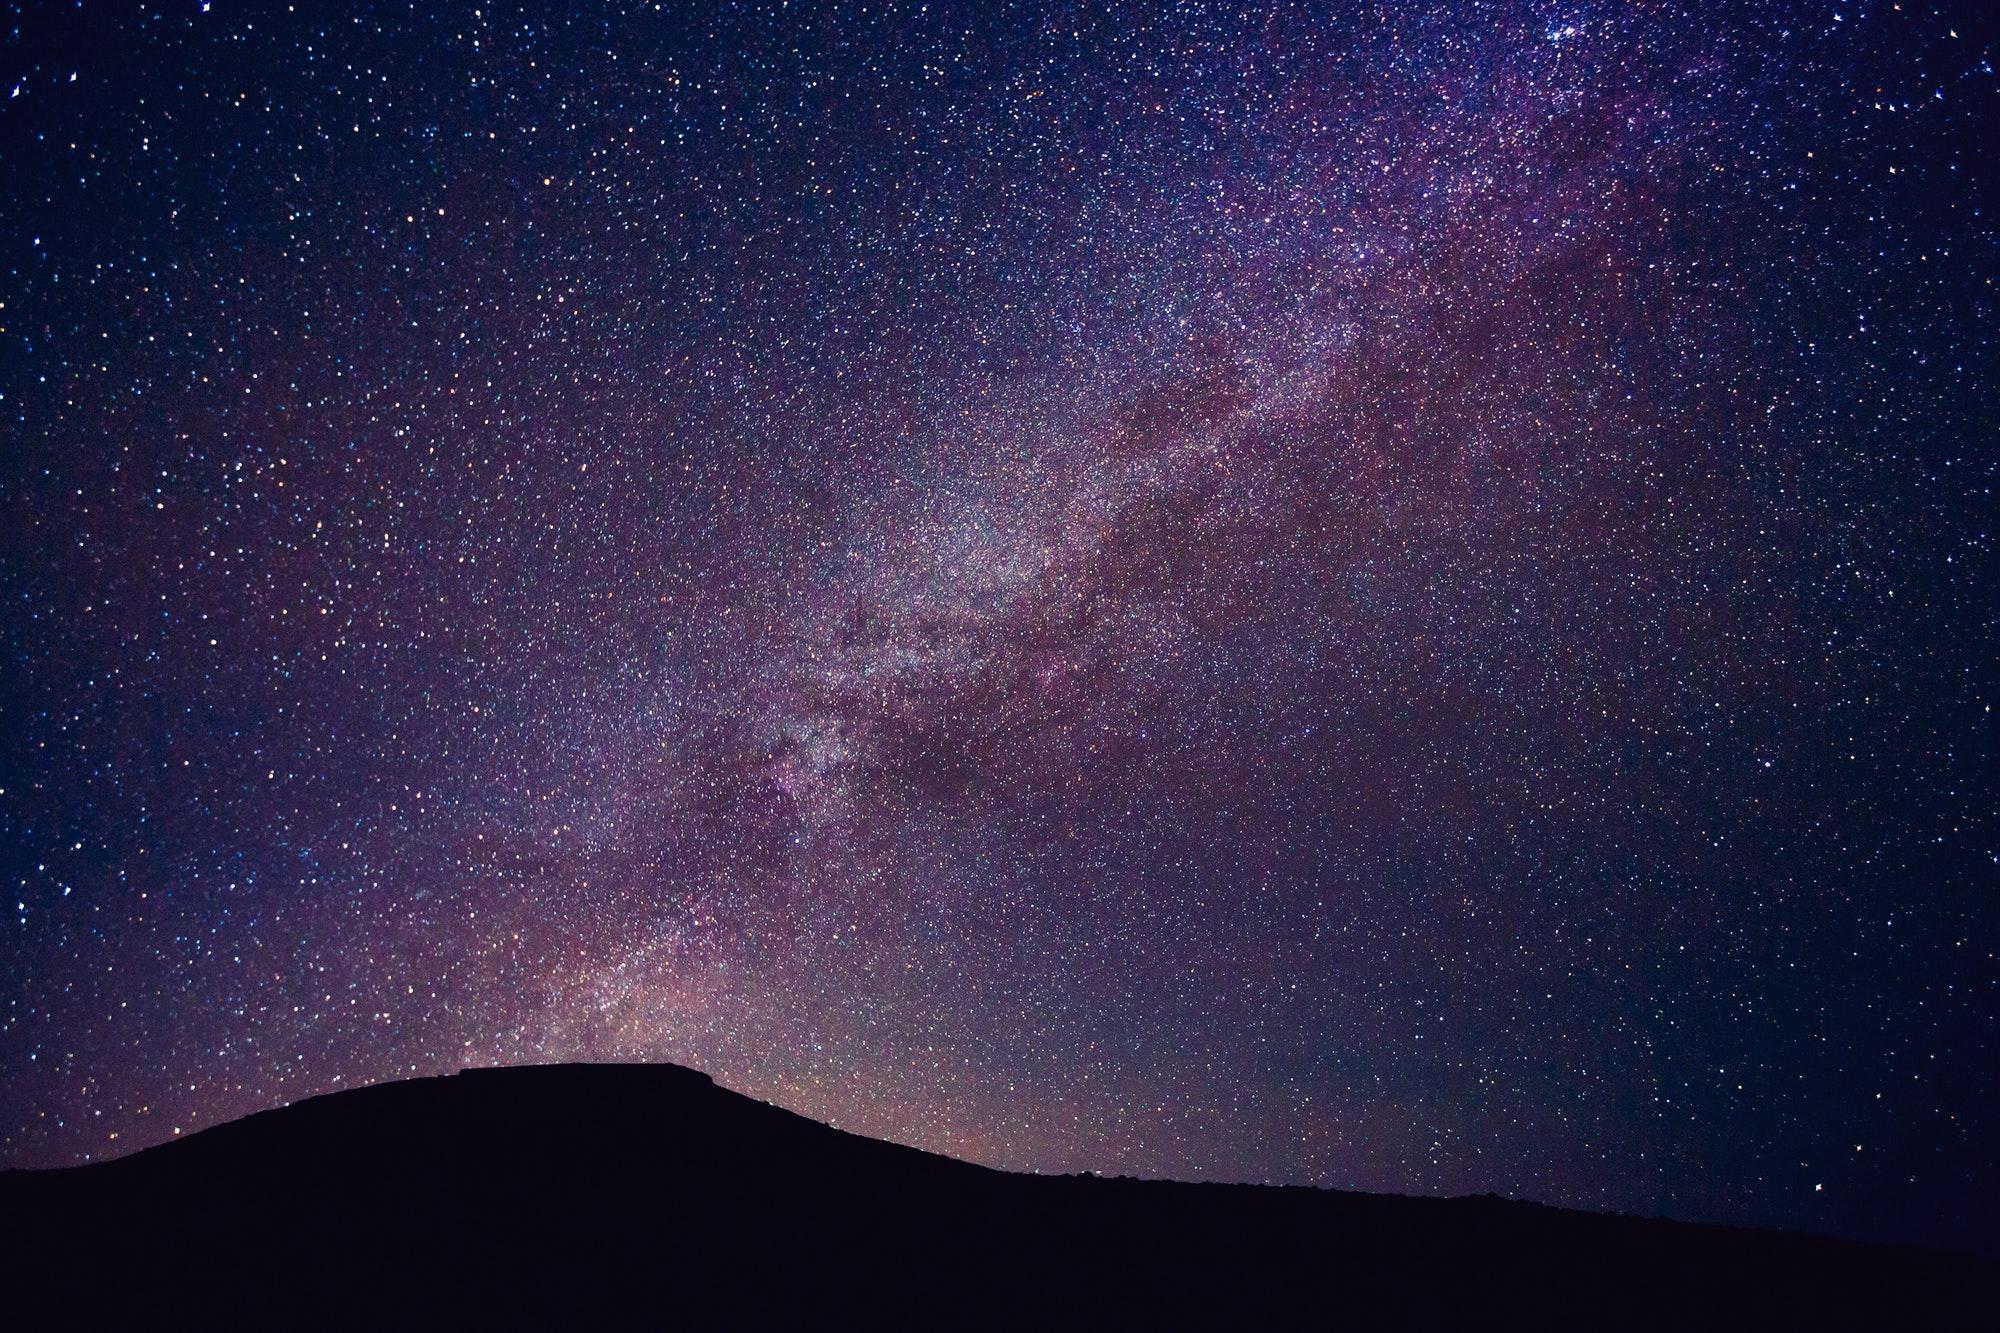 Night Sky with Stars and Galaxy